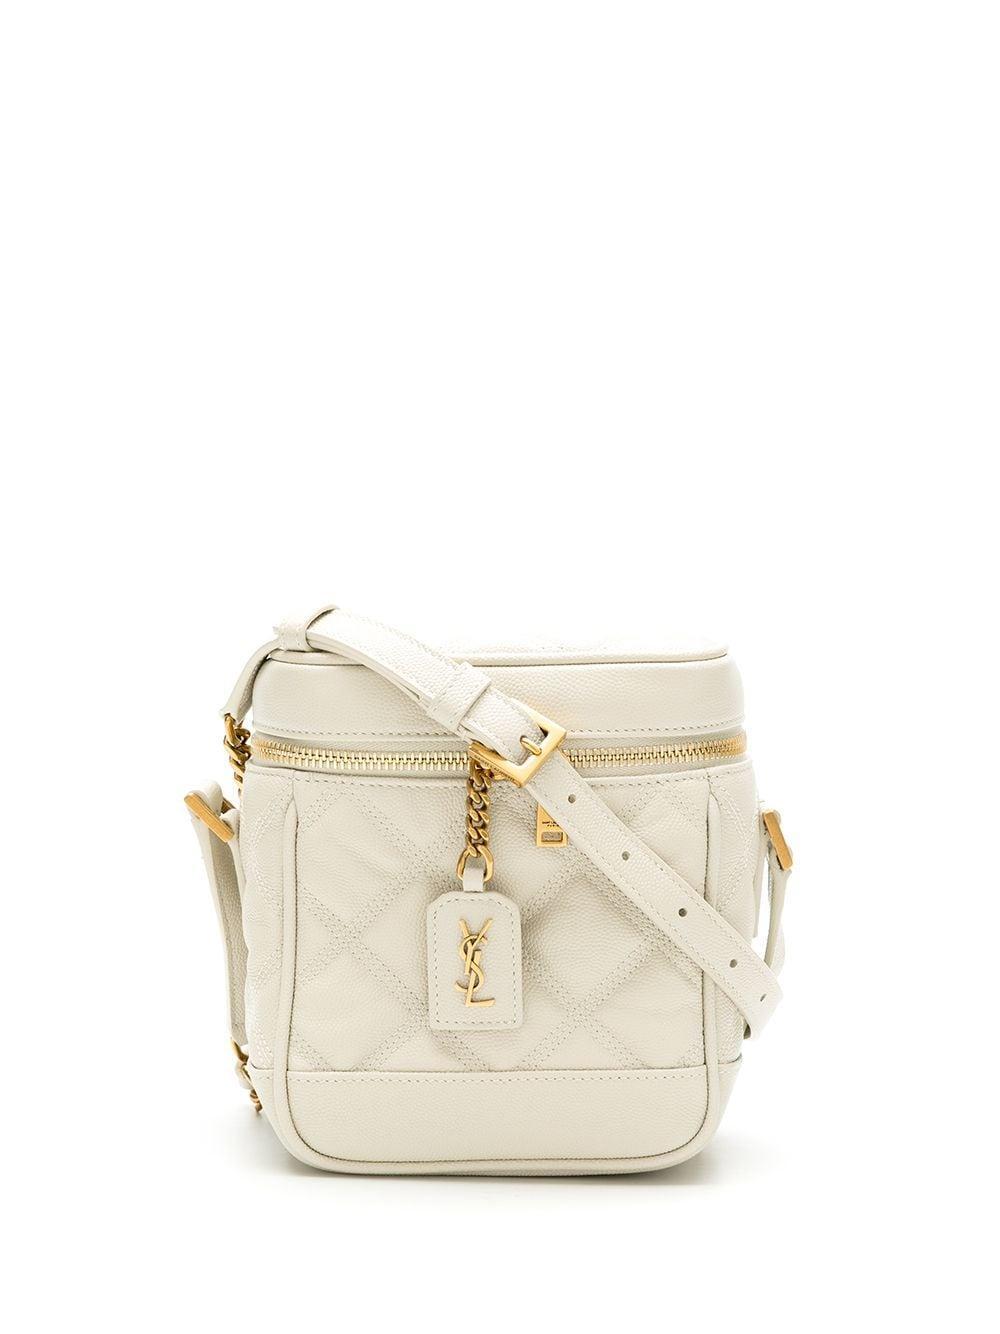 Quilted Vanity Bag